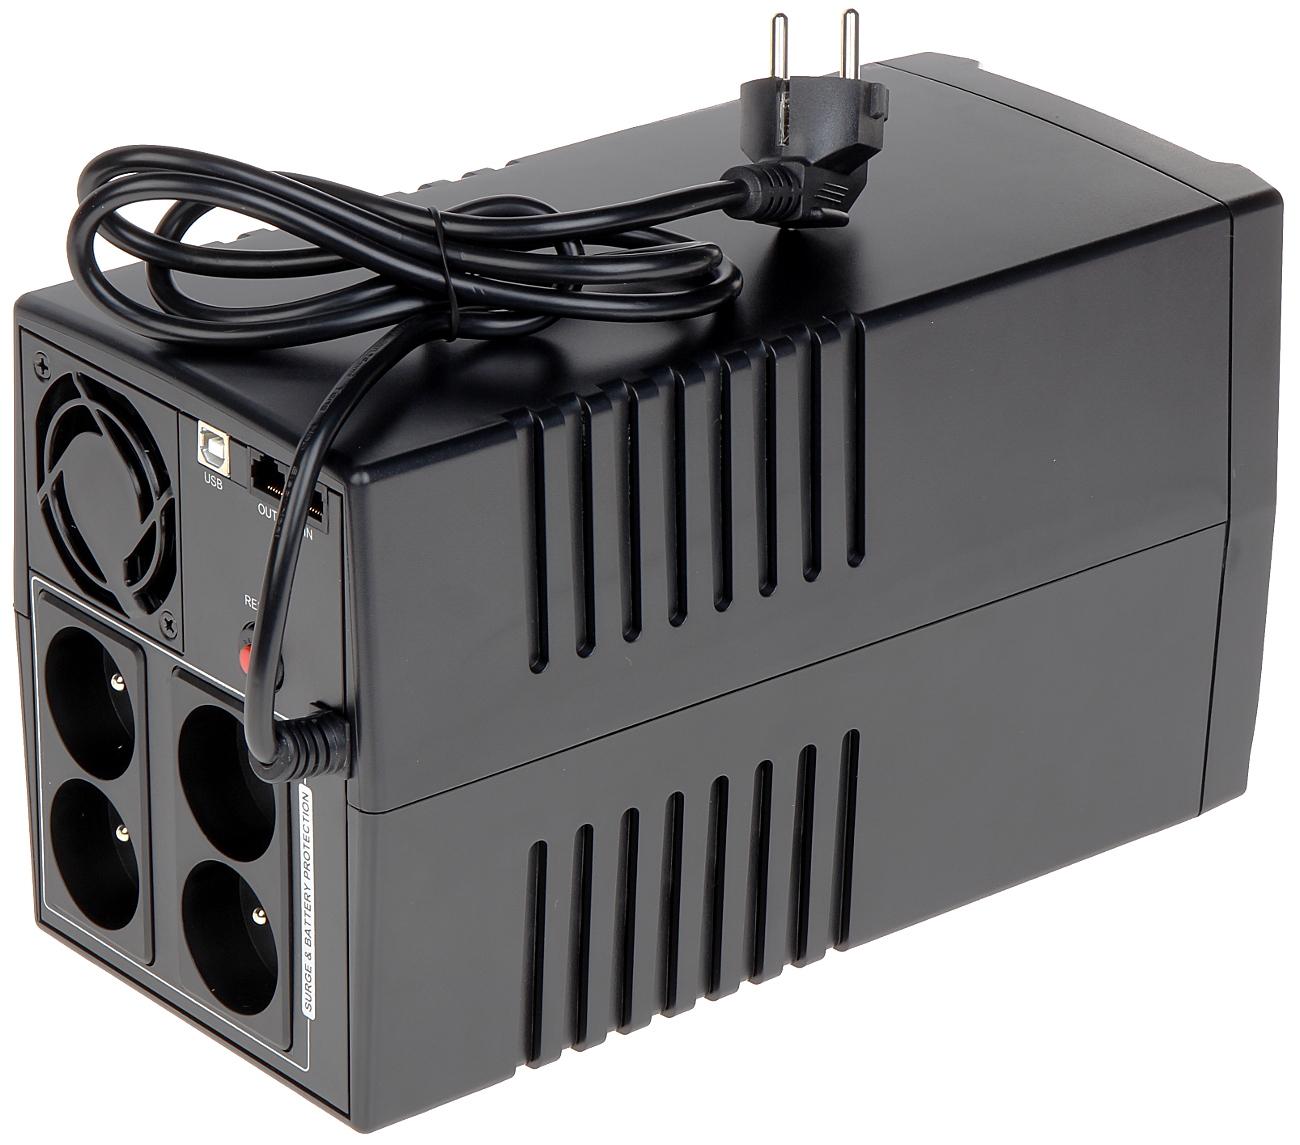 UPS UT1500E-FR/UPS 1500 VA CyberPower - Up to 1 kW - Delta